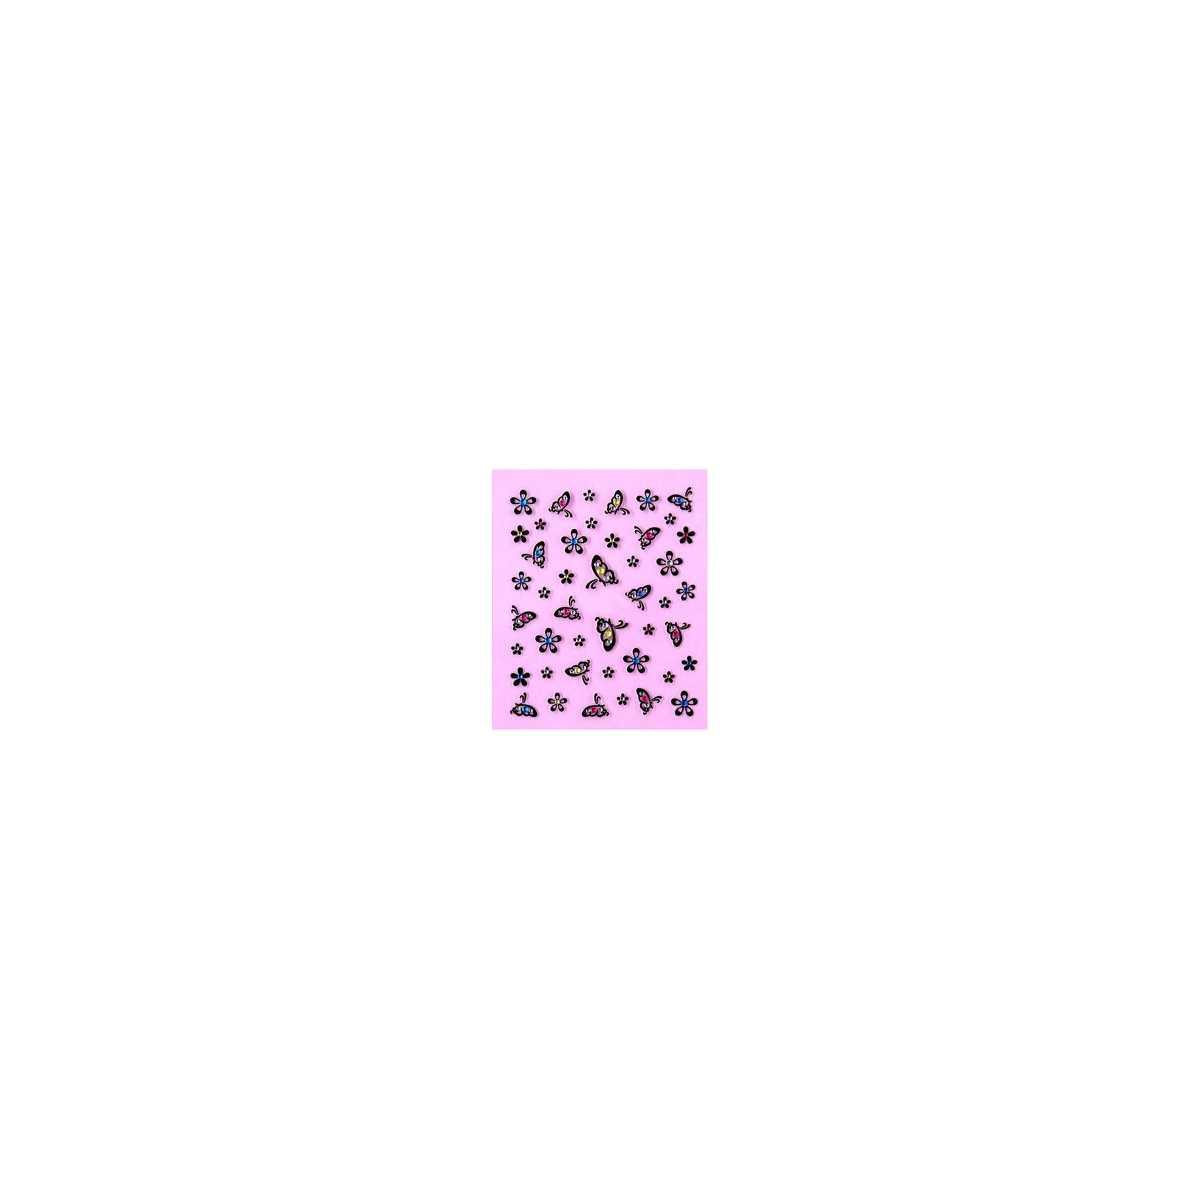 https://www.kit-manucure.com/641-thickbox_default/stickers-papillons-et-fleurs-avec-strass.jpg